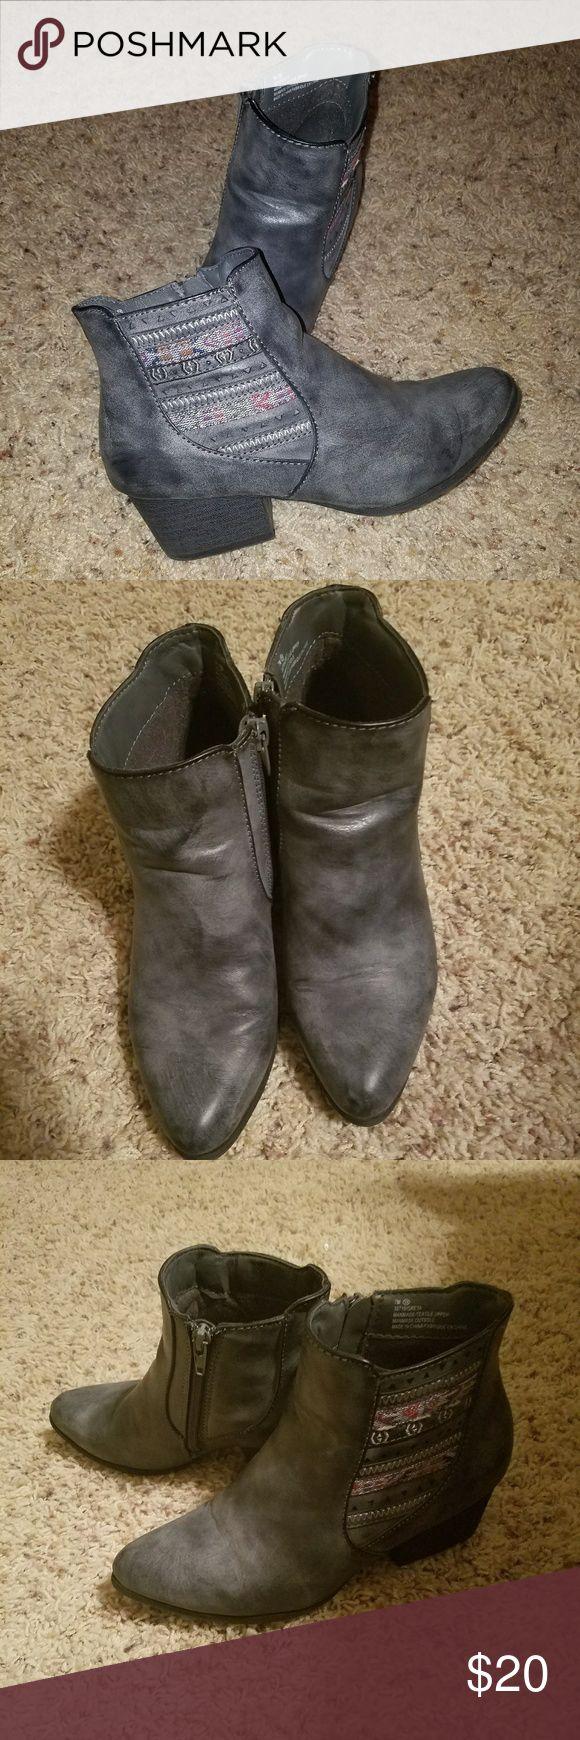 Maurices Greta Gray bootie sz 7 Maurices Greta Gray bootie sz 7 Maurices Shoes Ankle Boots & Booties